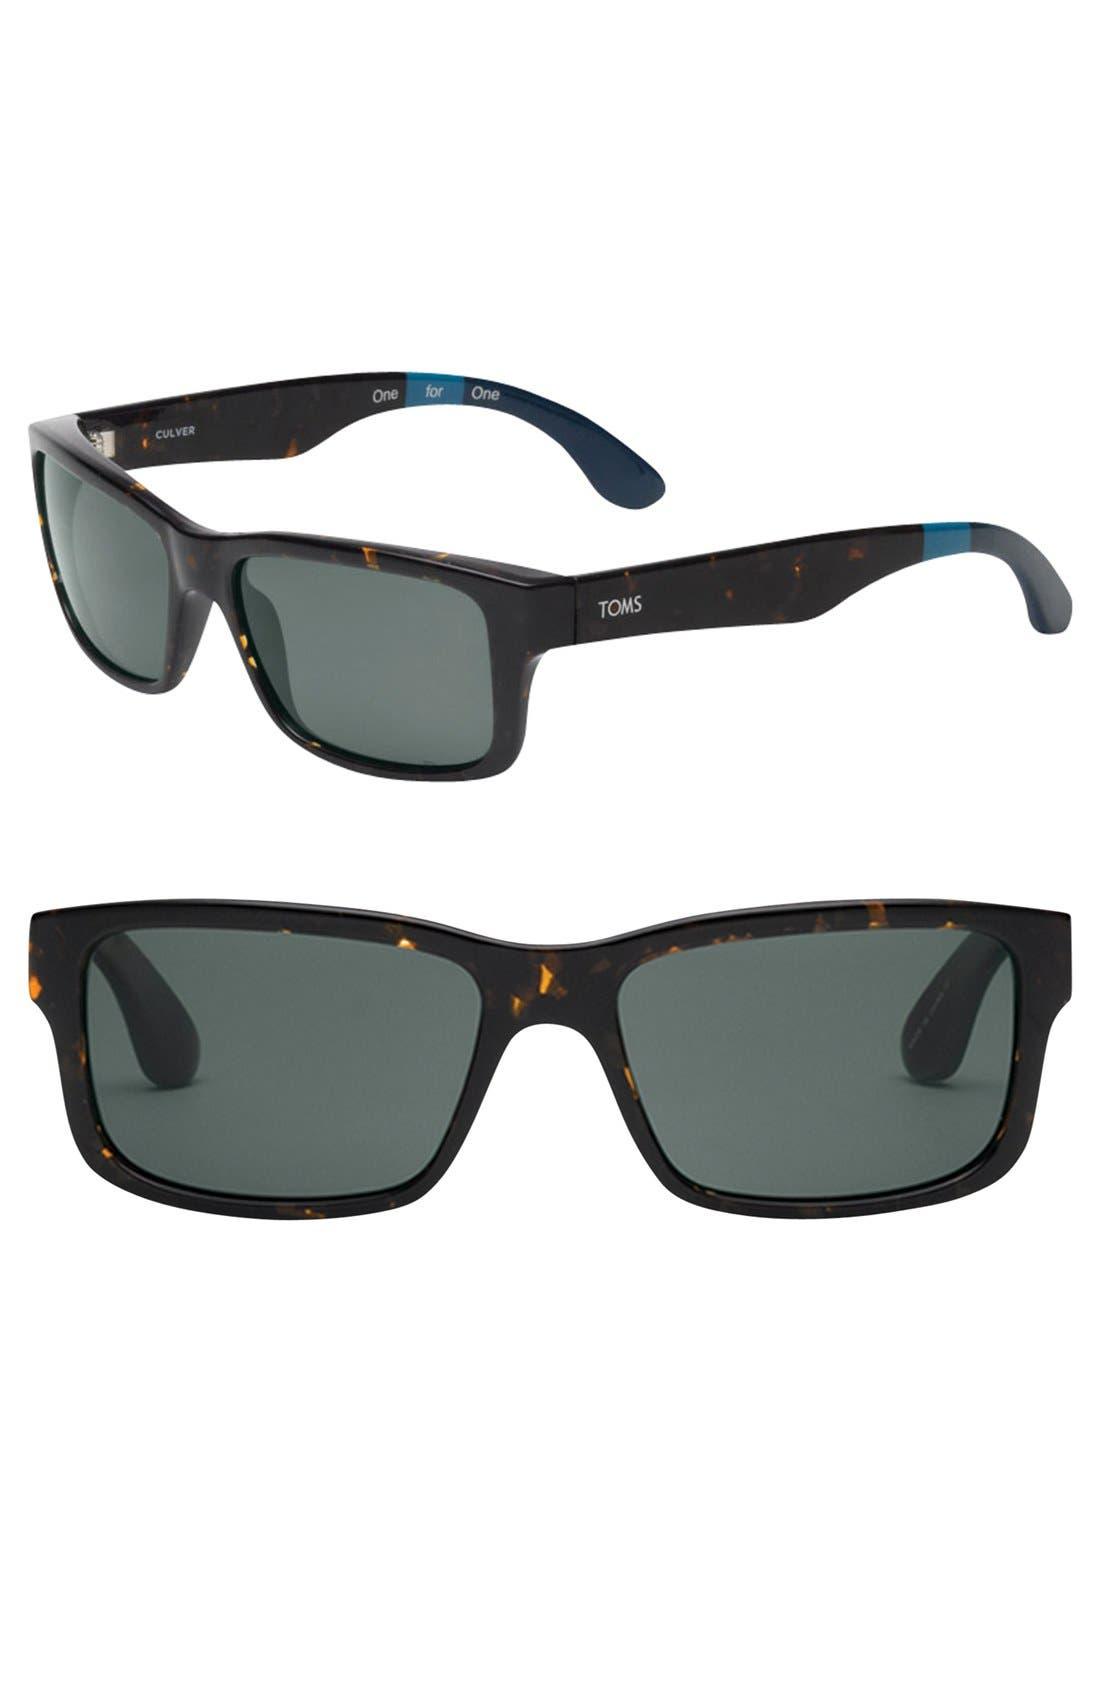 Main Image - TOMS 'Culver' 56mm Polarized Sunglasses